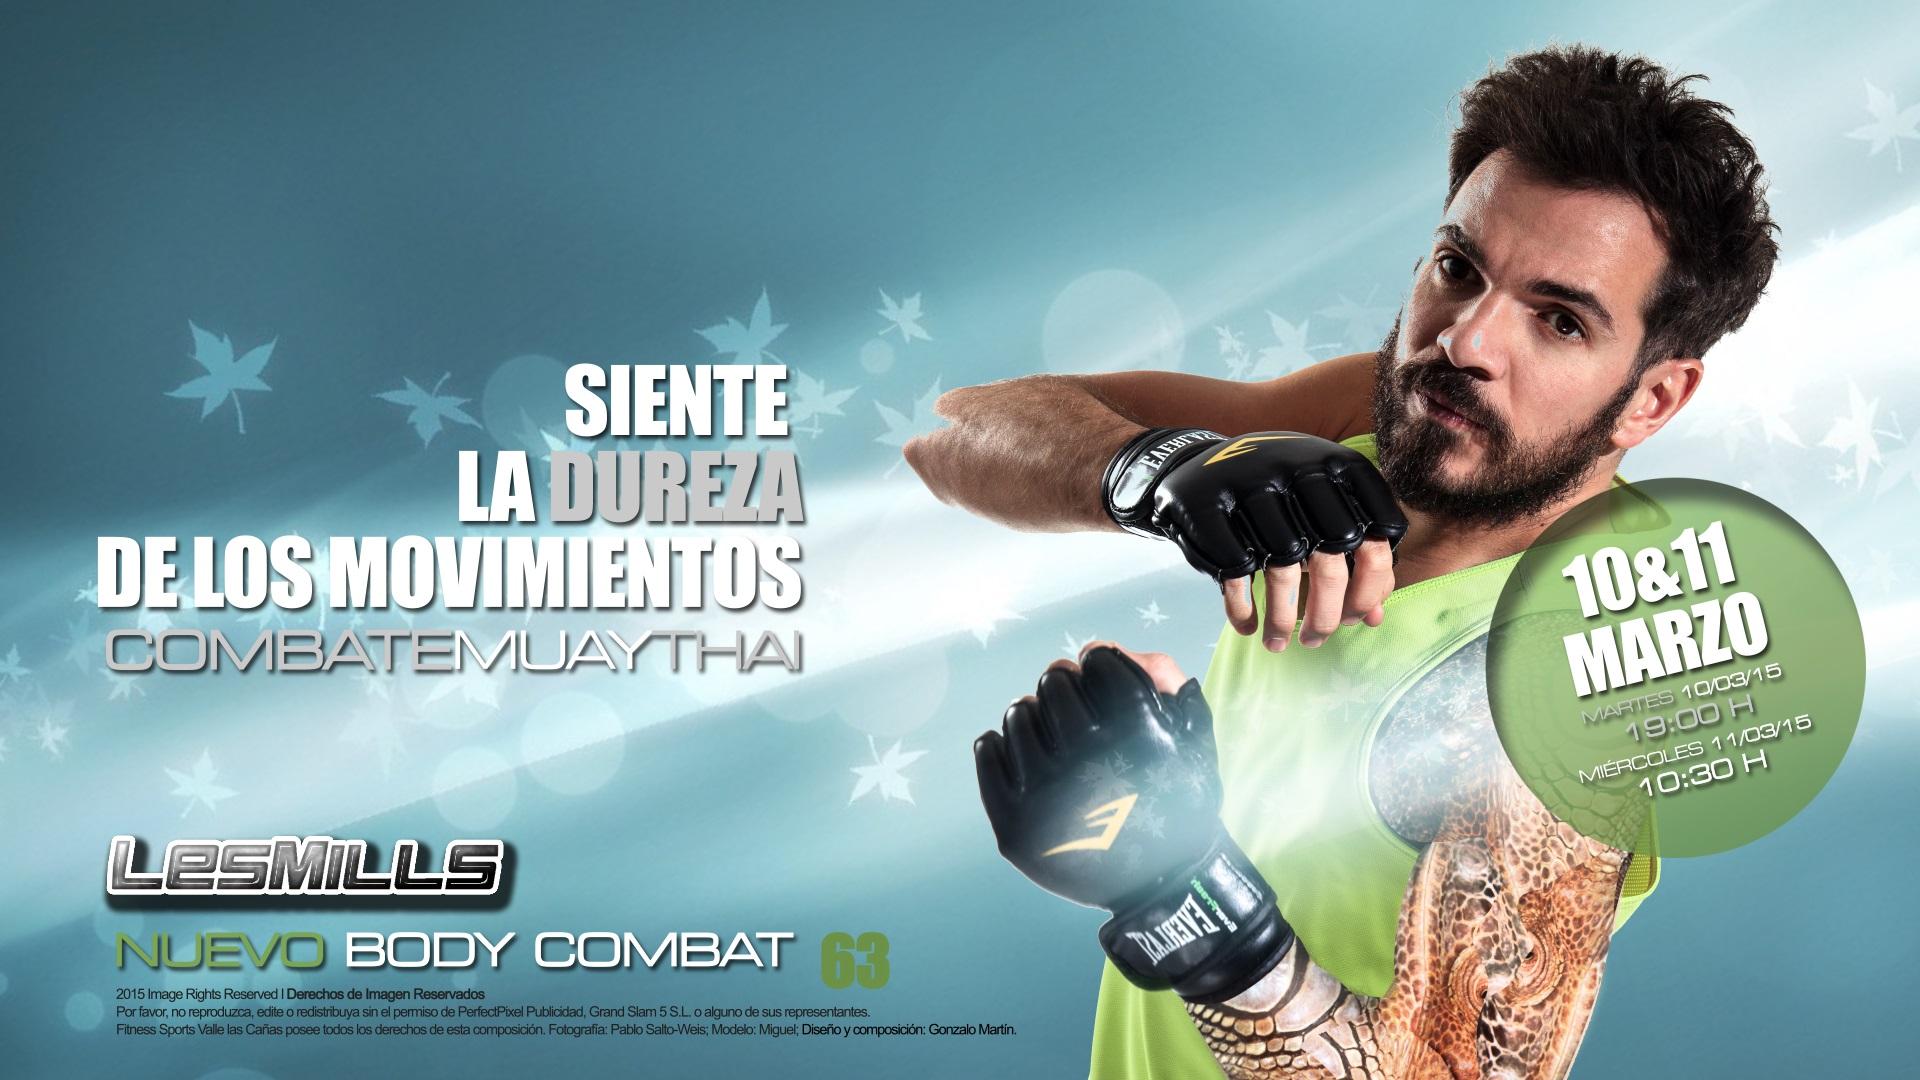 https://www.perfectpixel.es/wp-content/uploads/2015/03/Body-Combat-63-New-Release-Fitness-Sports-Valle-las-Ca%C3%B1as-by-PerfectPixel-Publicidad-Advertisement-Siente-la-dureza-de-los-movimientos-News.jpg